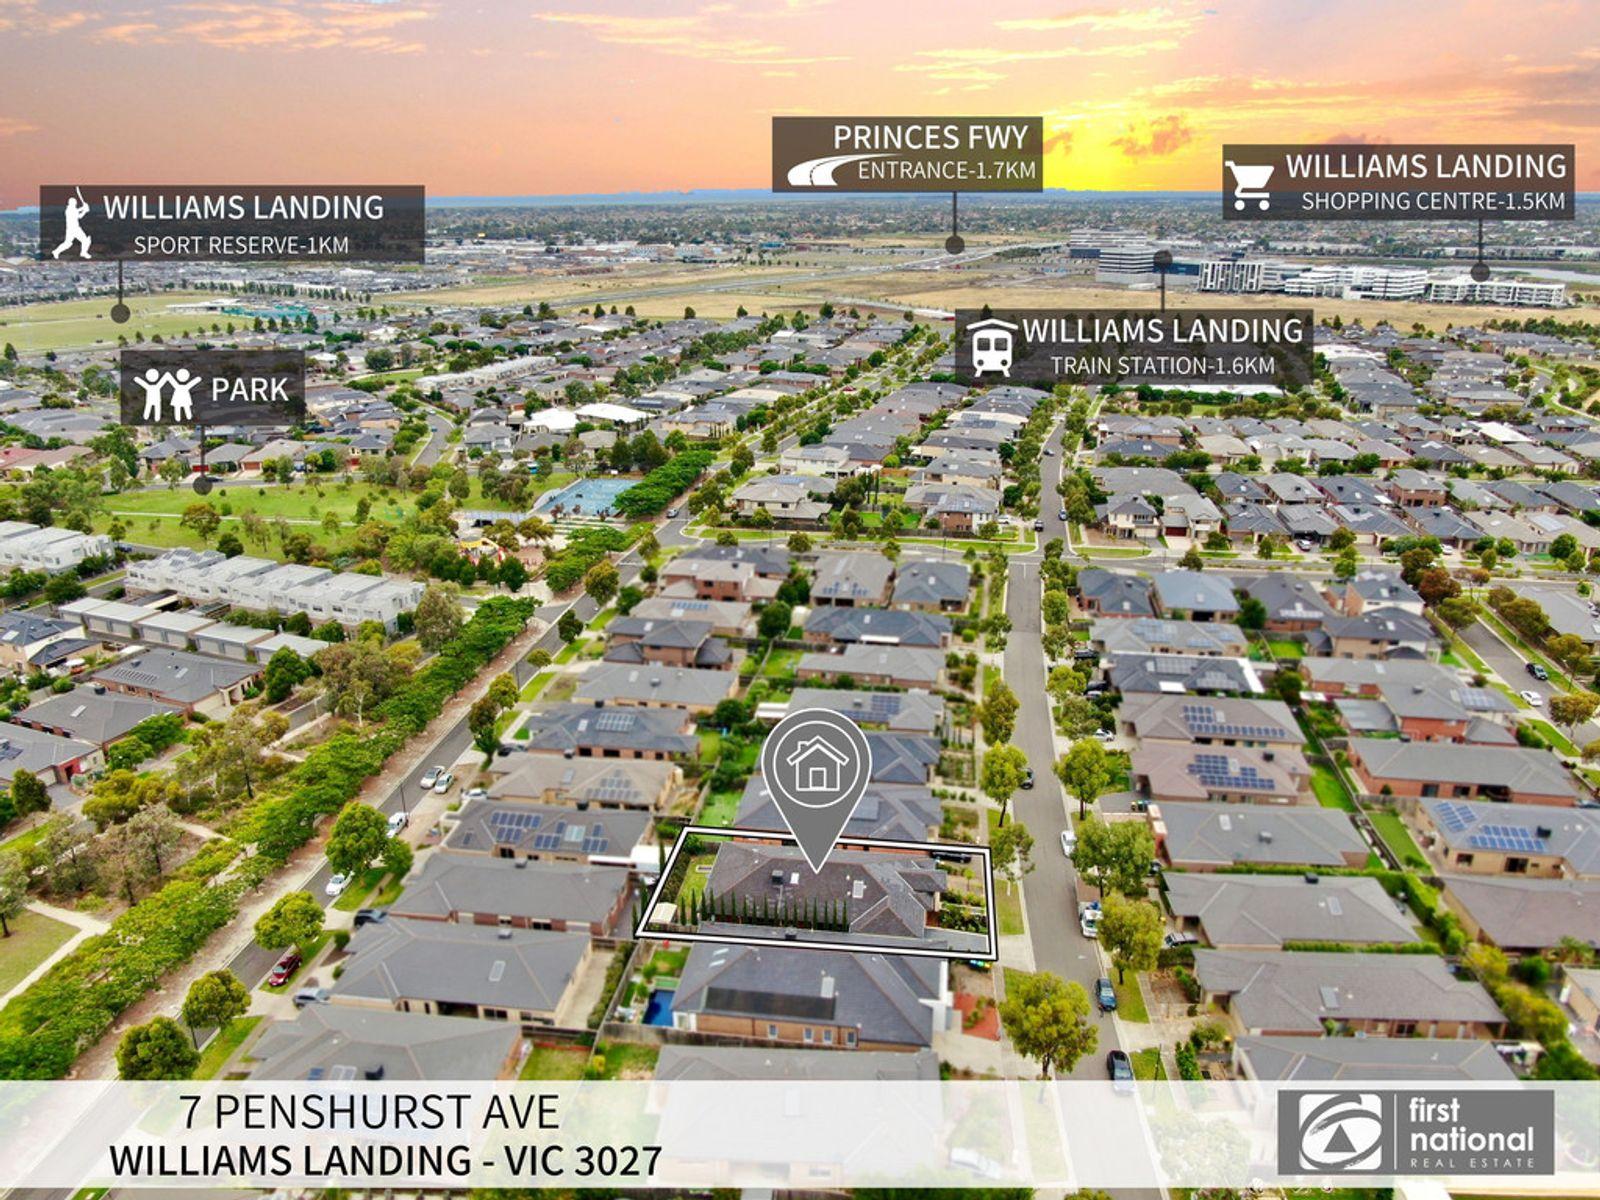 7 Penshurst Avenue, Williams Landing, VIC 3027